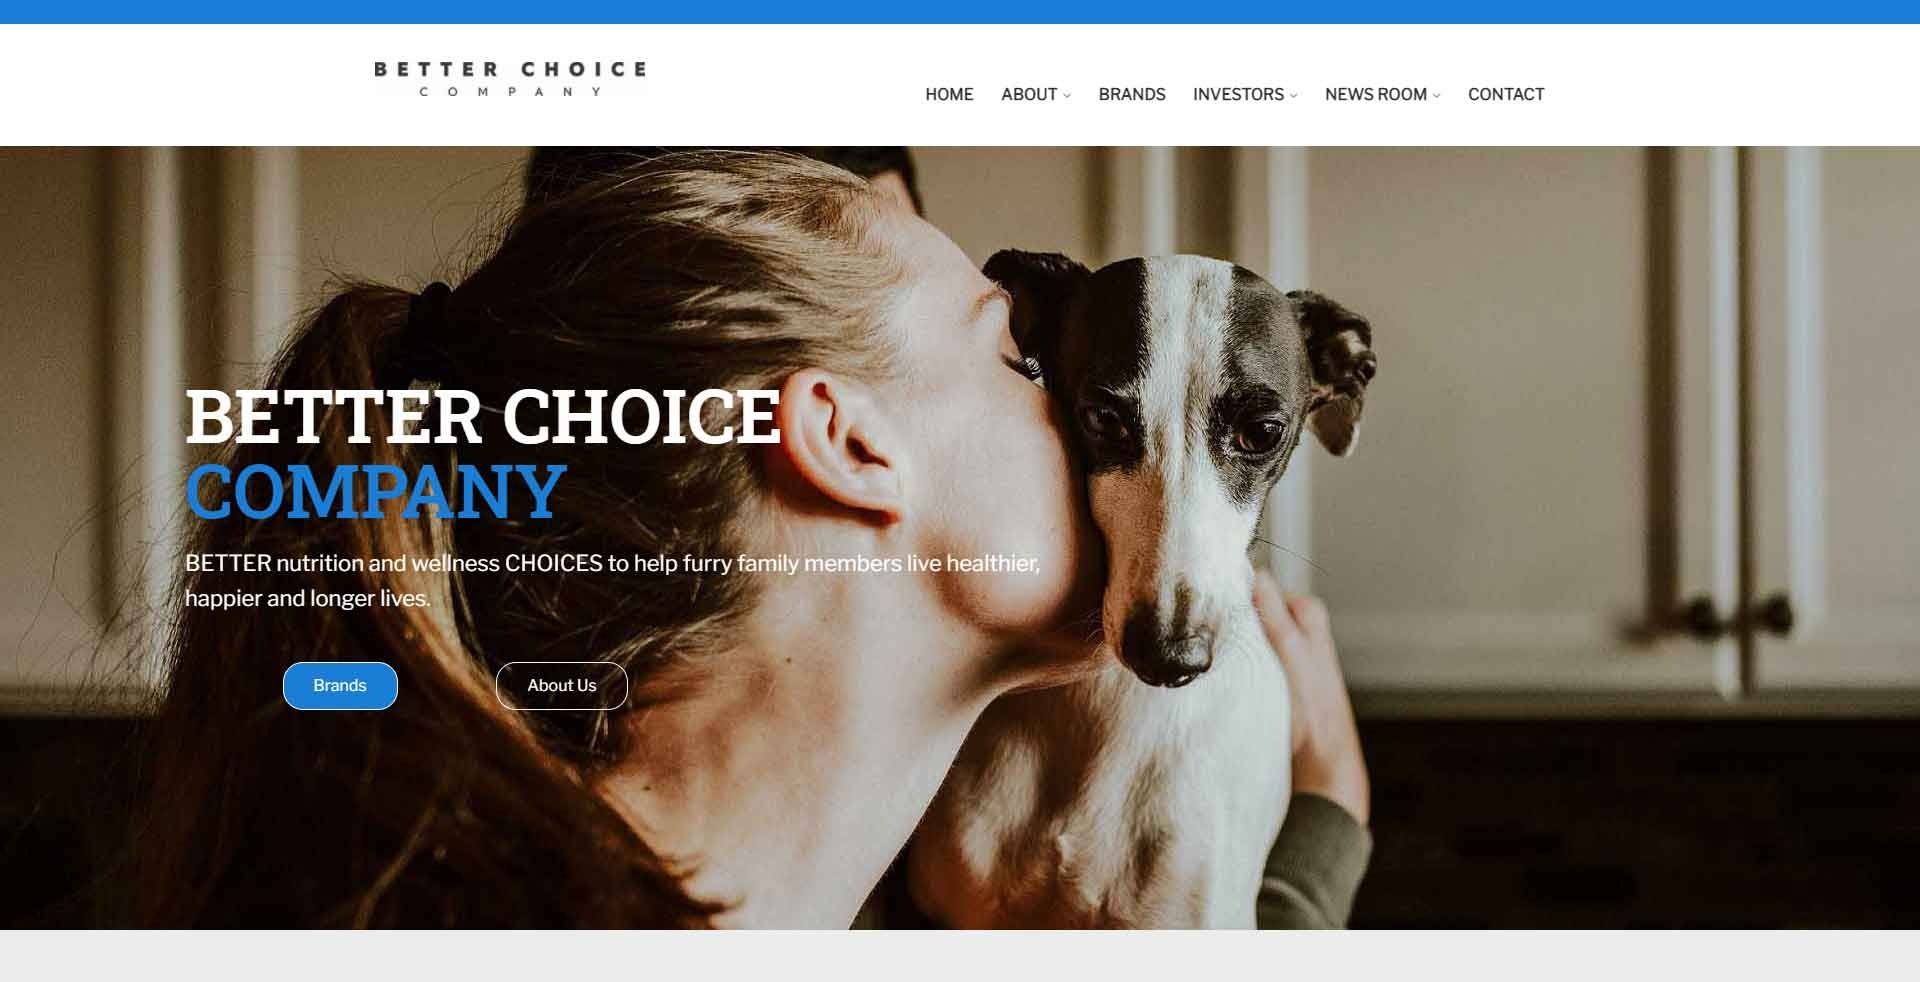 Investor & Holdings Company Website Design